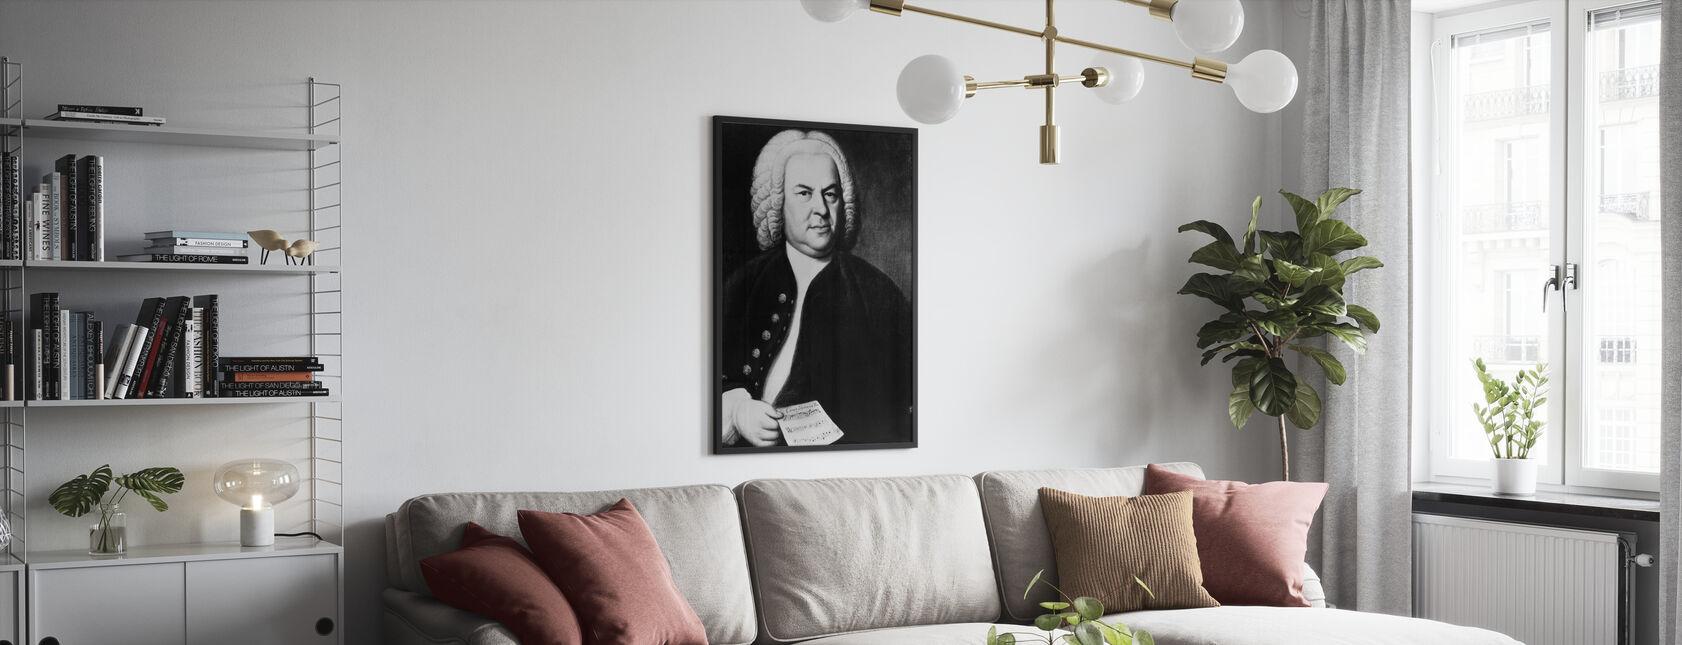 Johann Sebastian Bach - Poster - Salotto